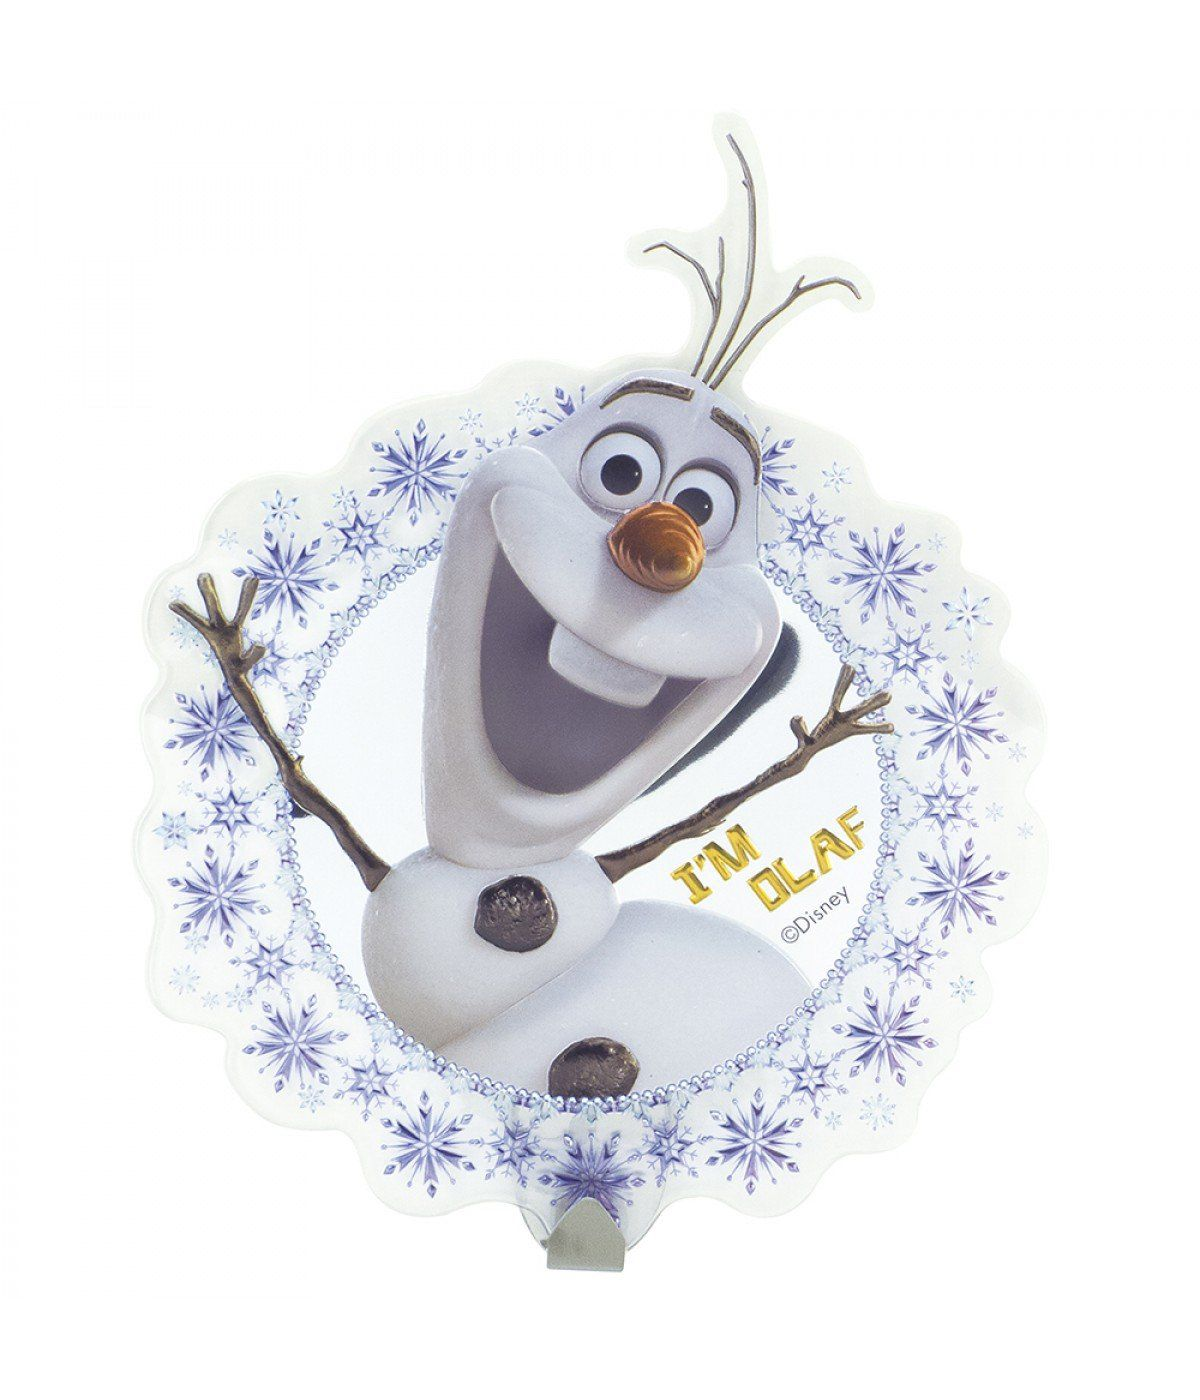 Adesivo com Gancho Olaf: Frozen (Disney)